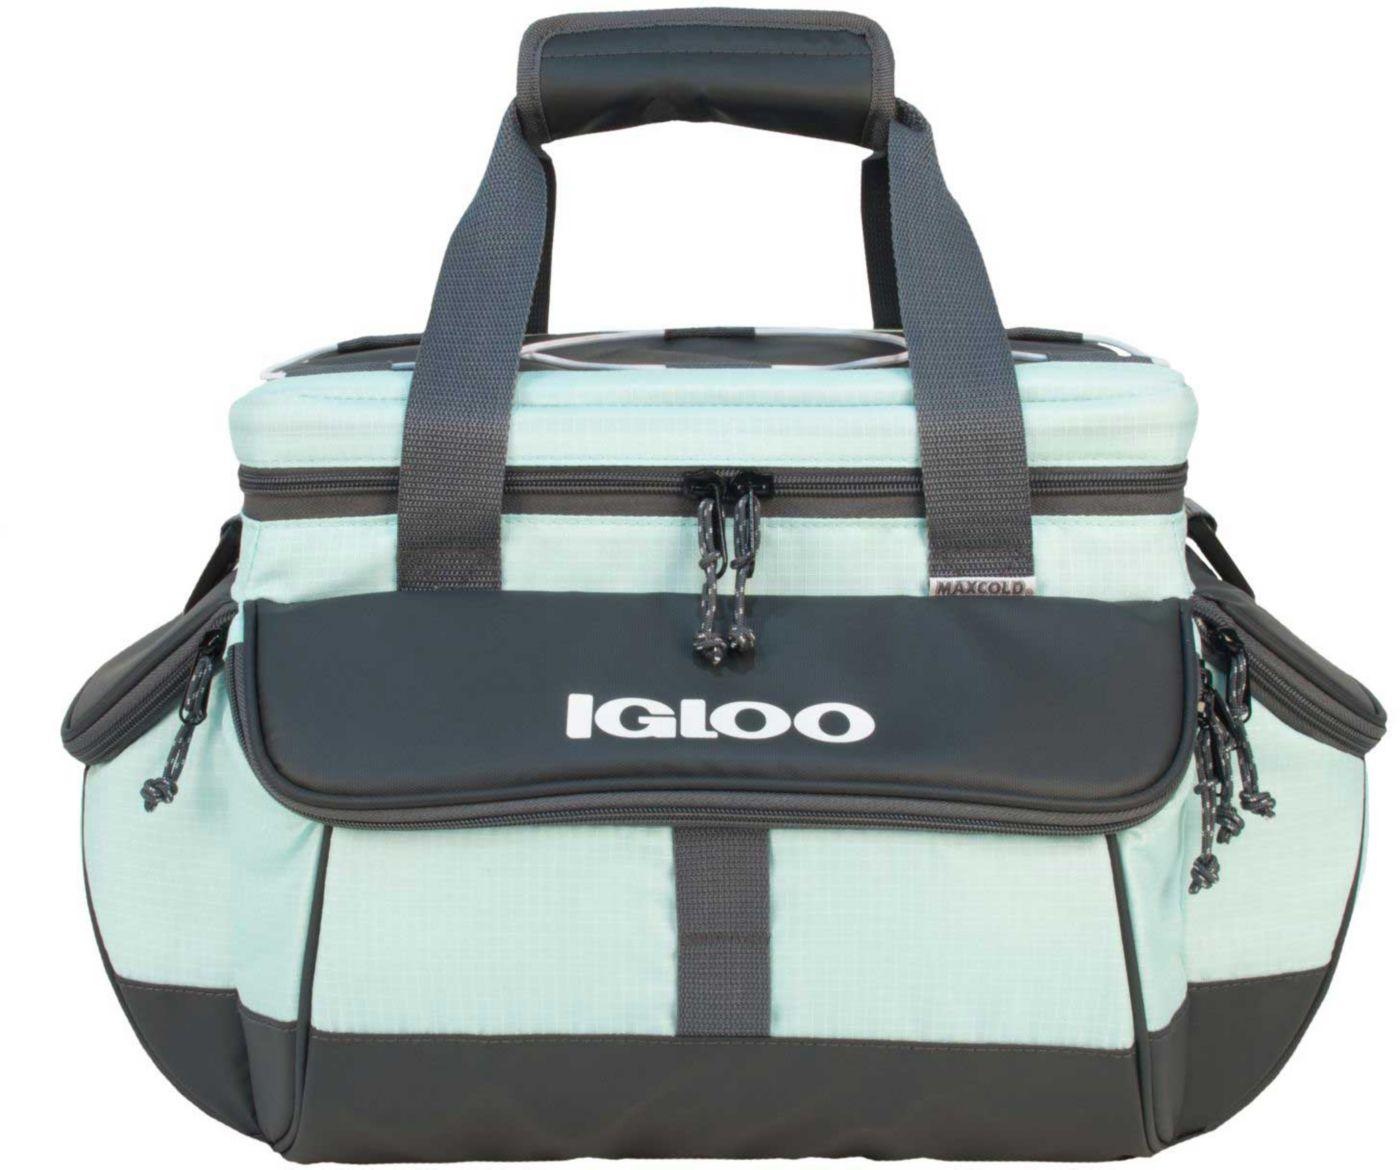 Igloo Ringleader Backcountry Cooler Bag